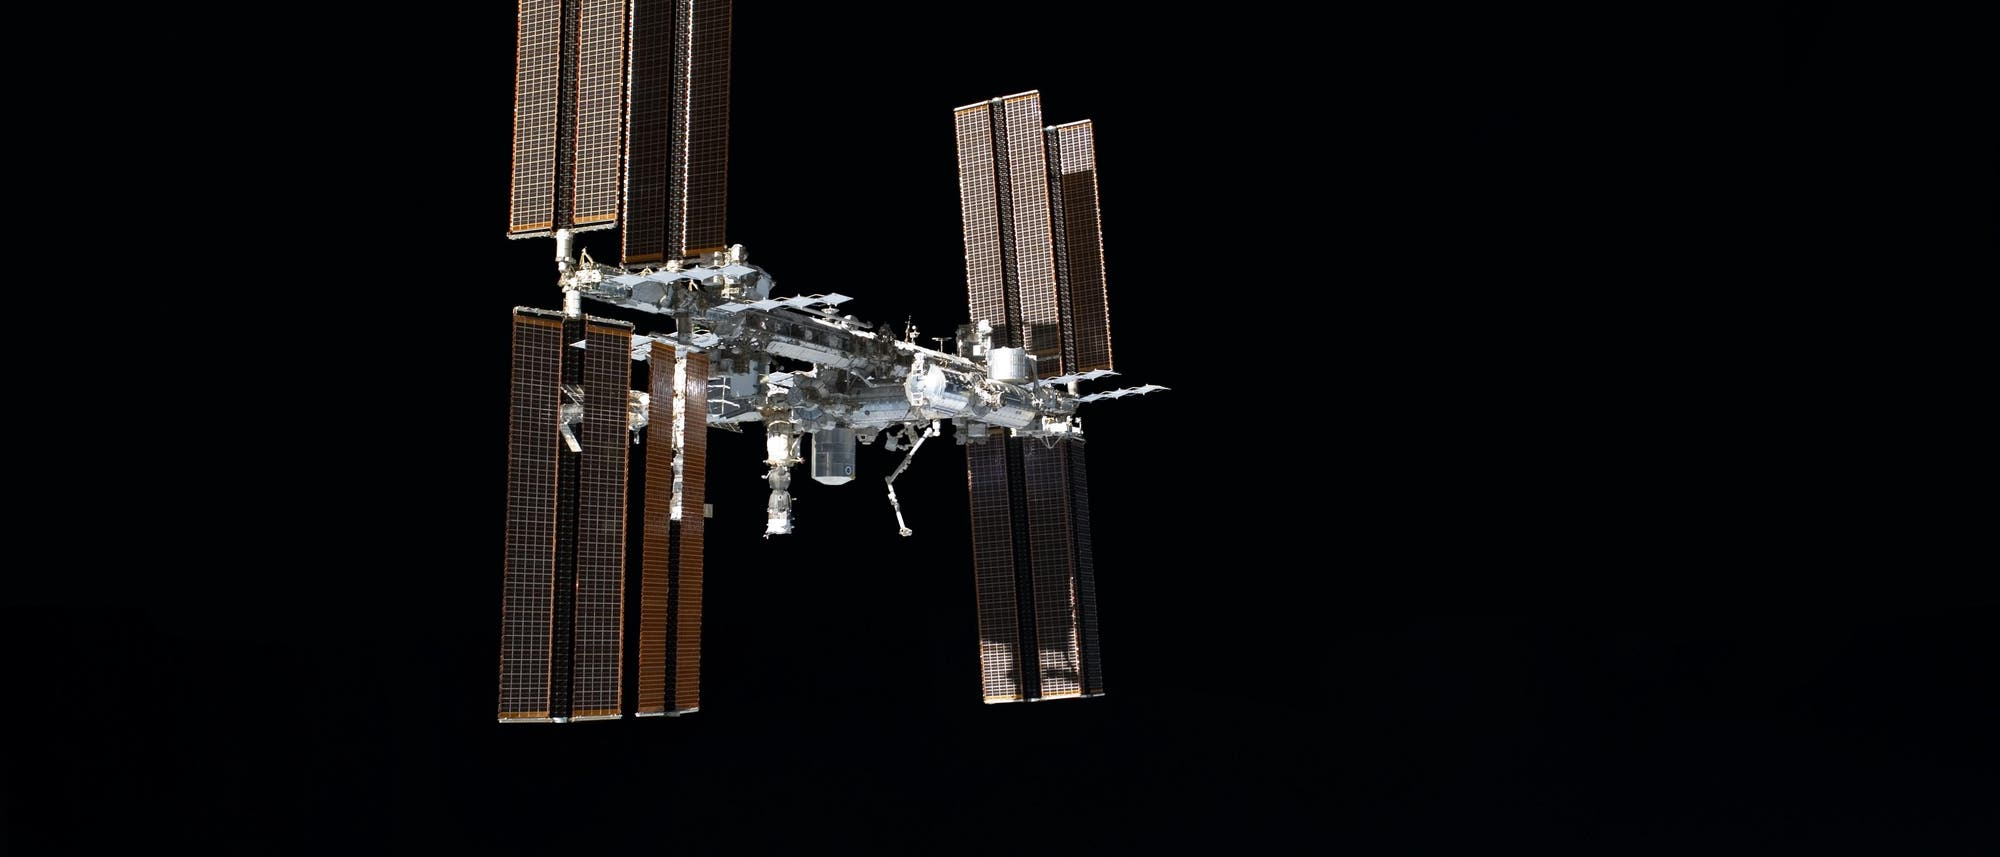 Die ISS im Orbit